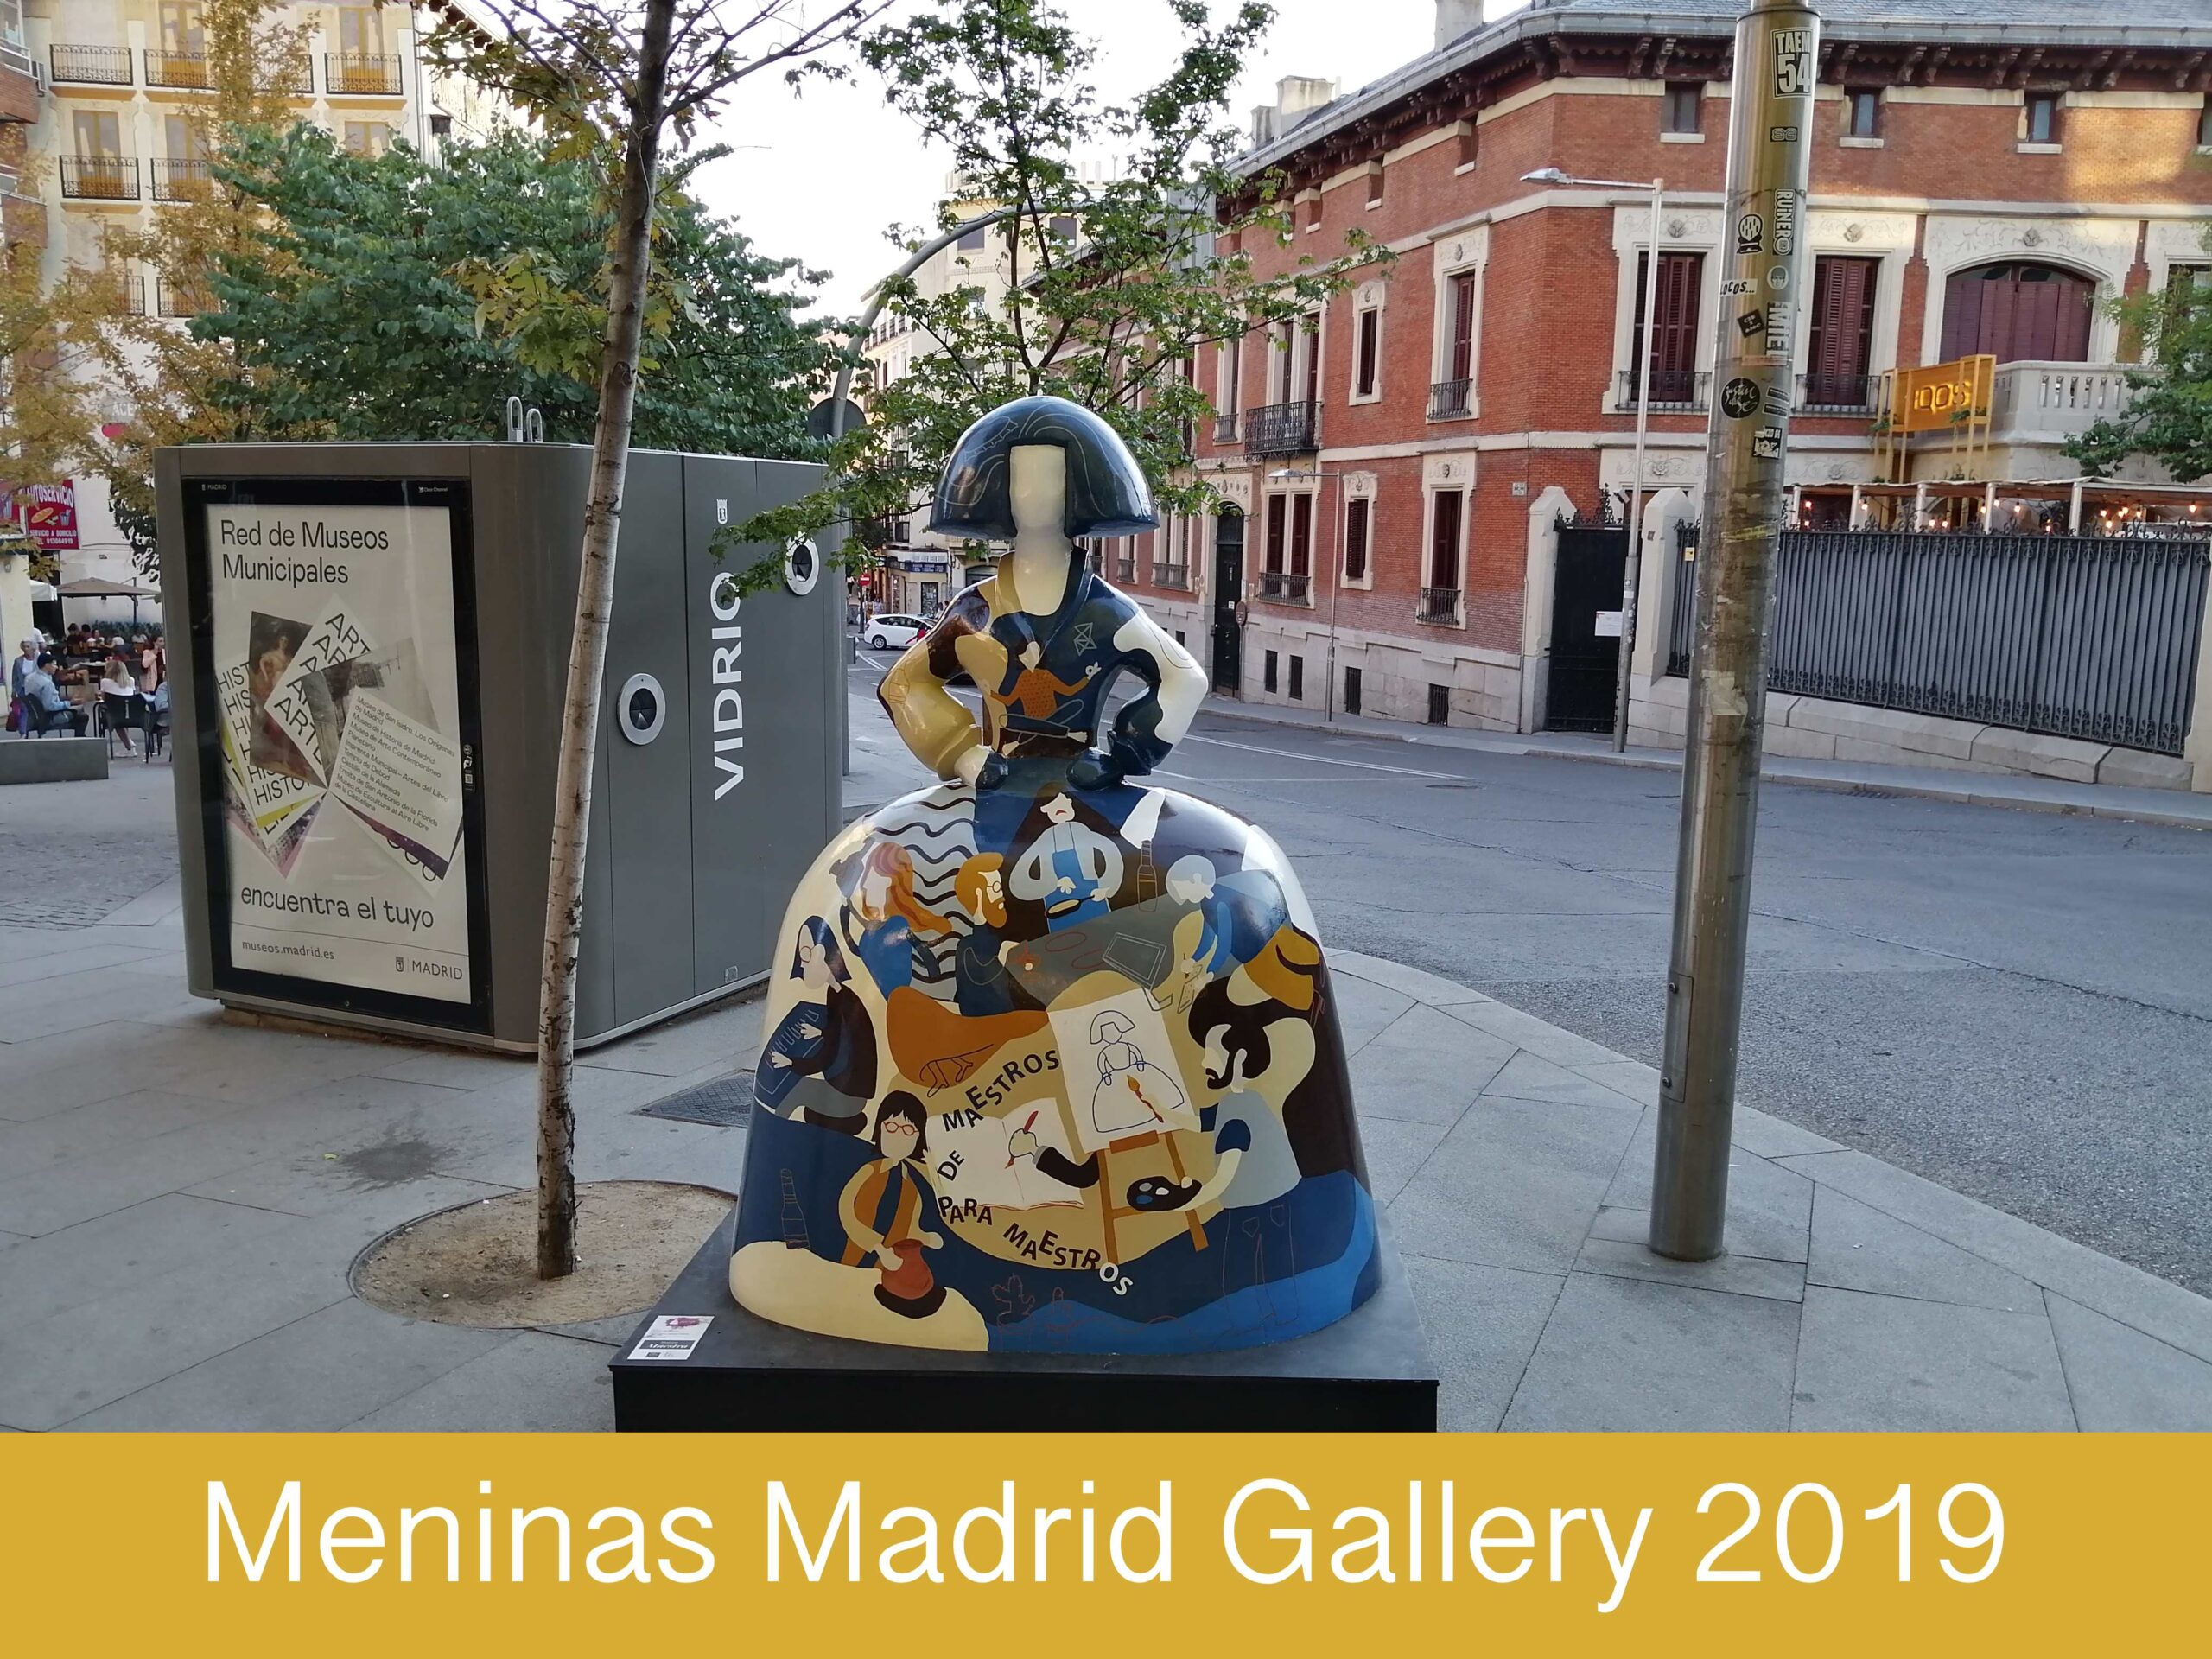 Las Meninas Madrid Gallery 2019